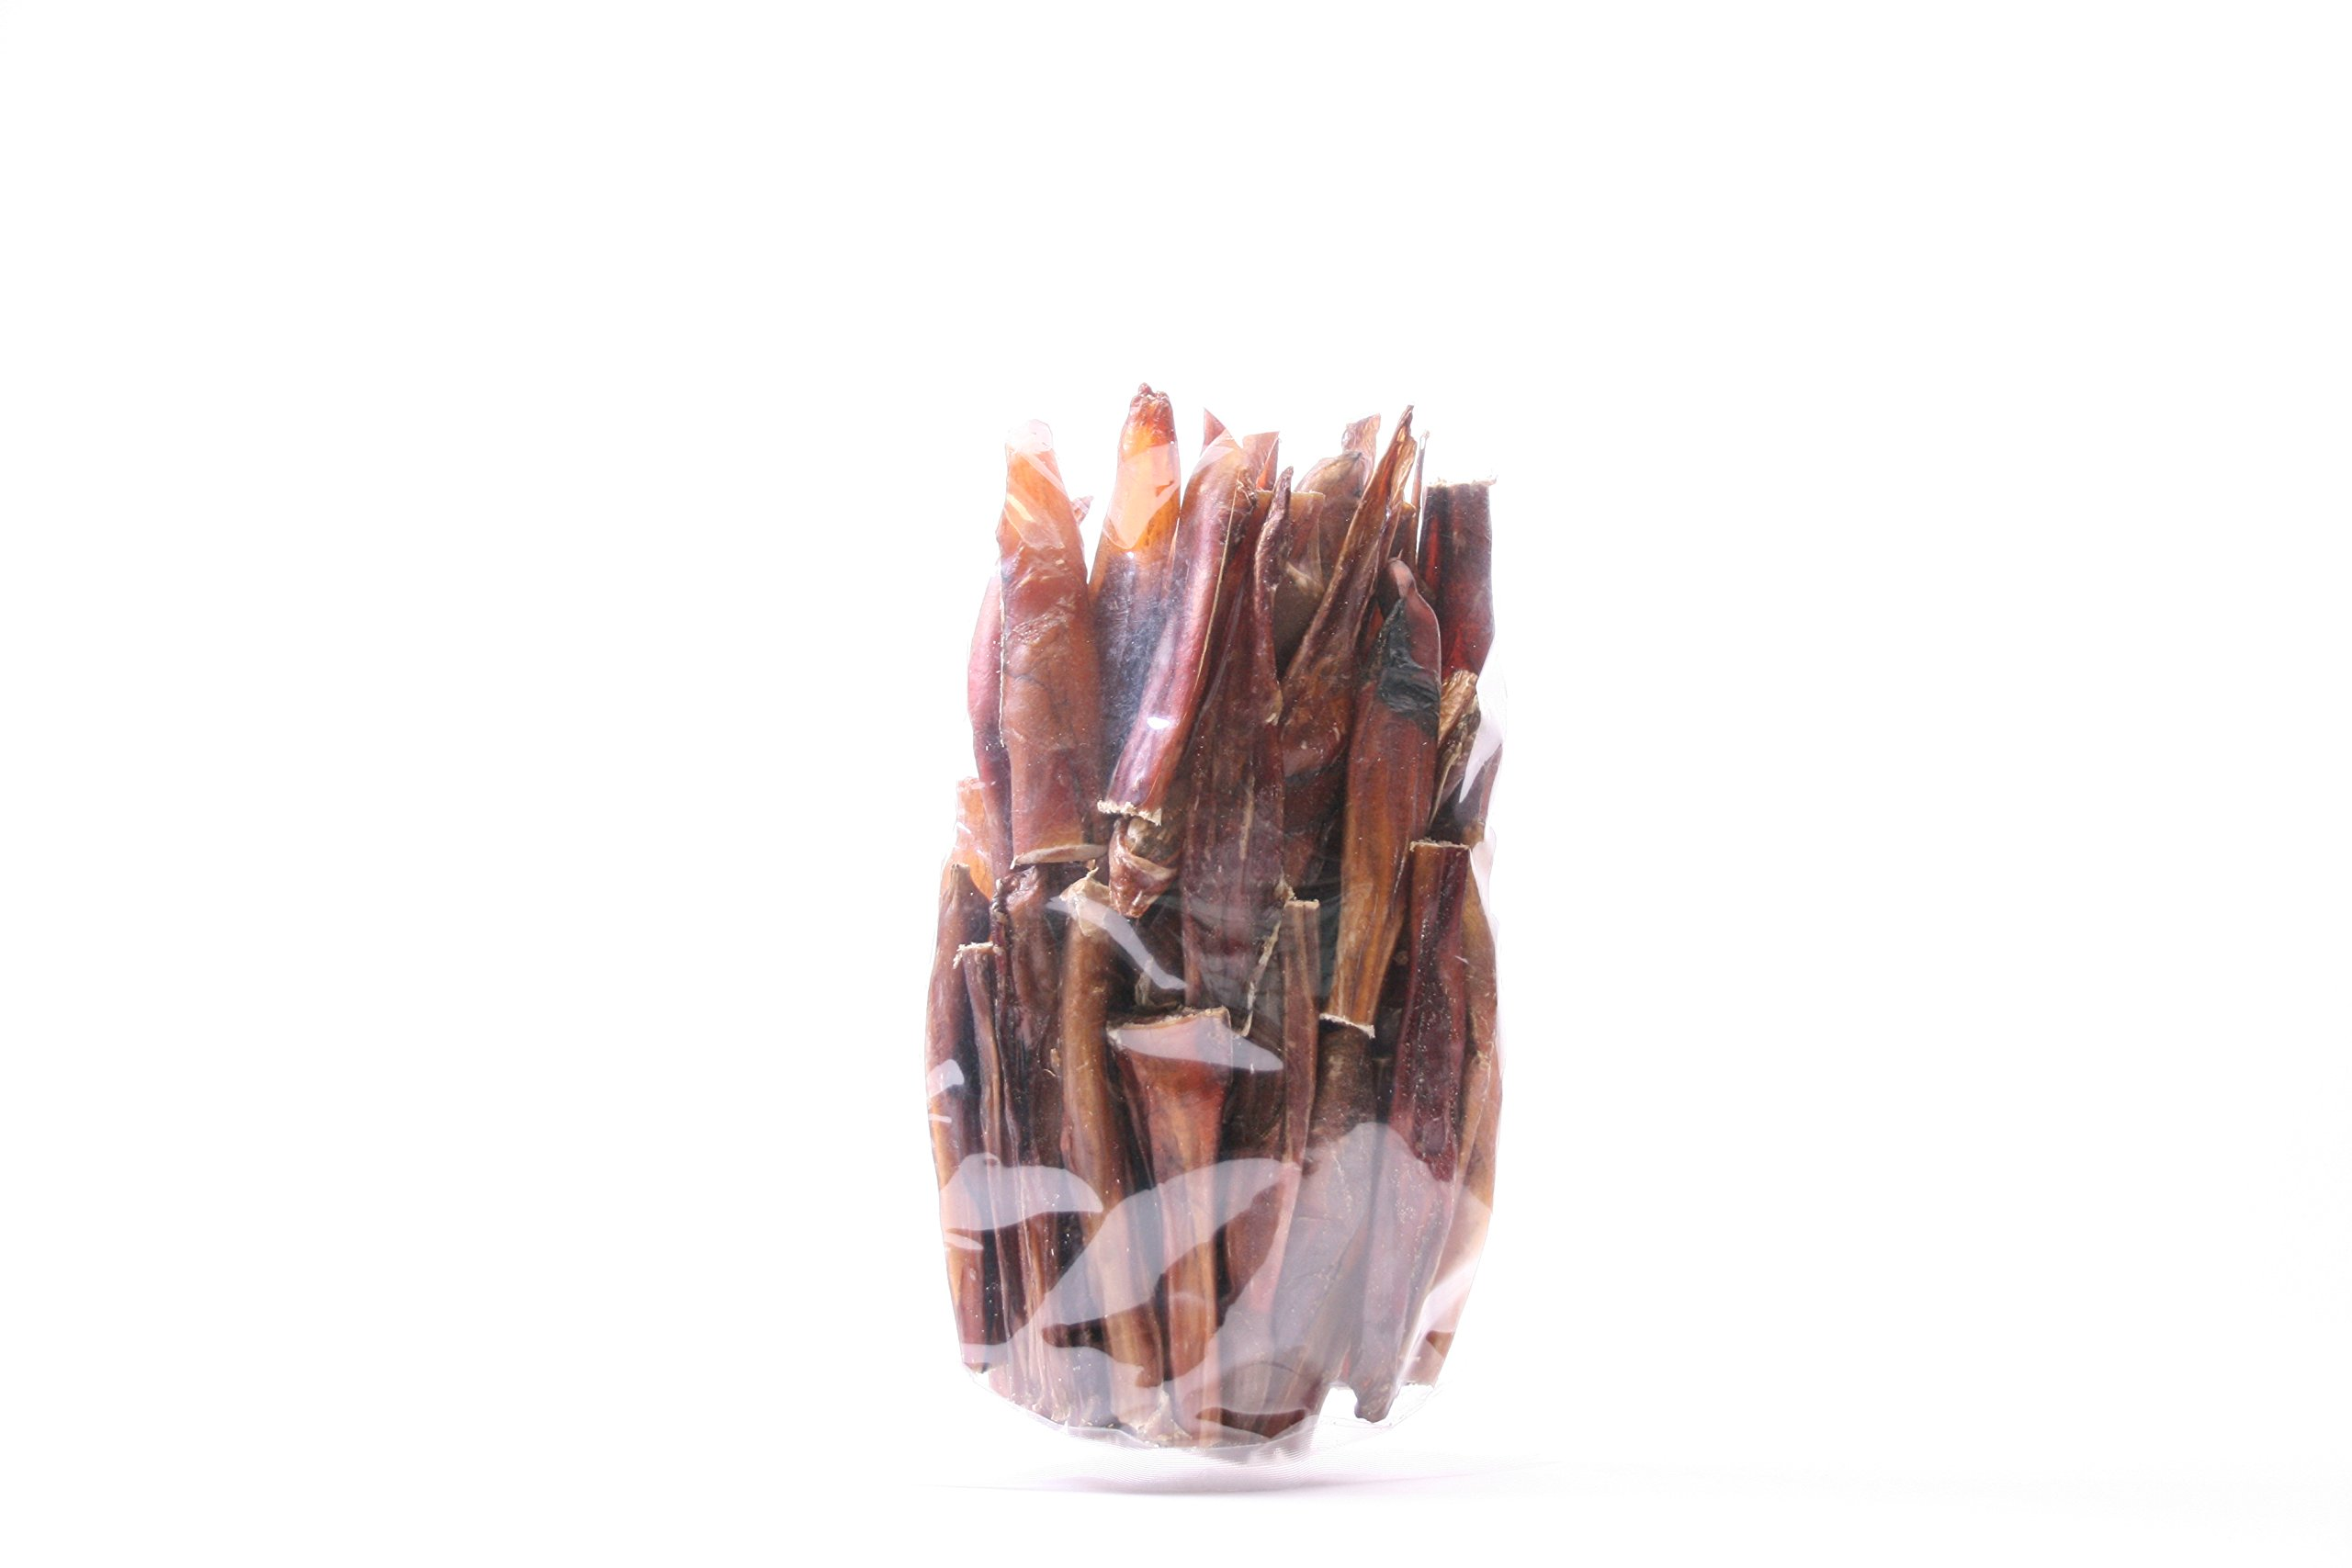 GoGo Beef Pizzle Steer Sticks, 4 inch Steer Sticks, USA Made Dog Treats (50 Pack)...